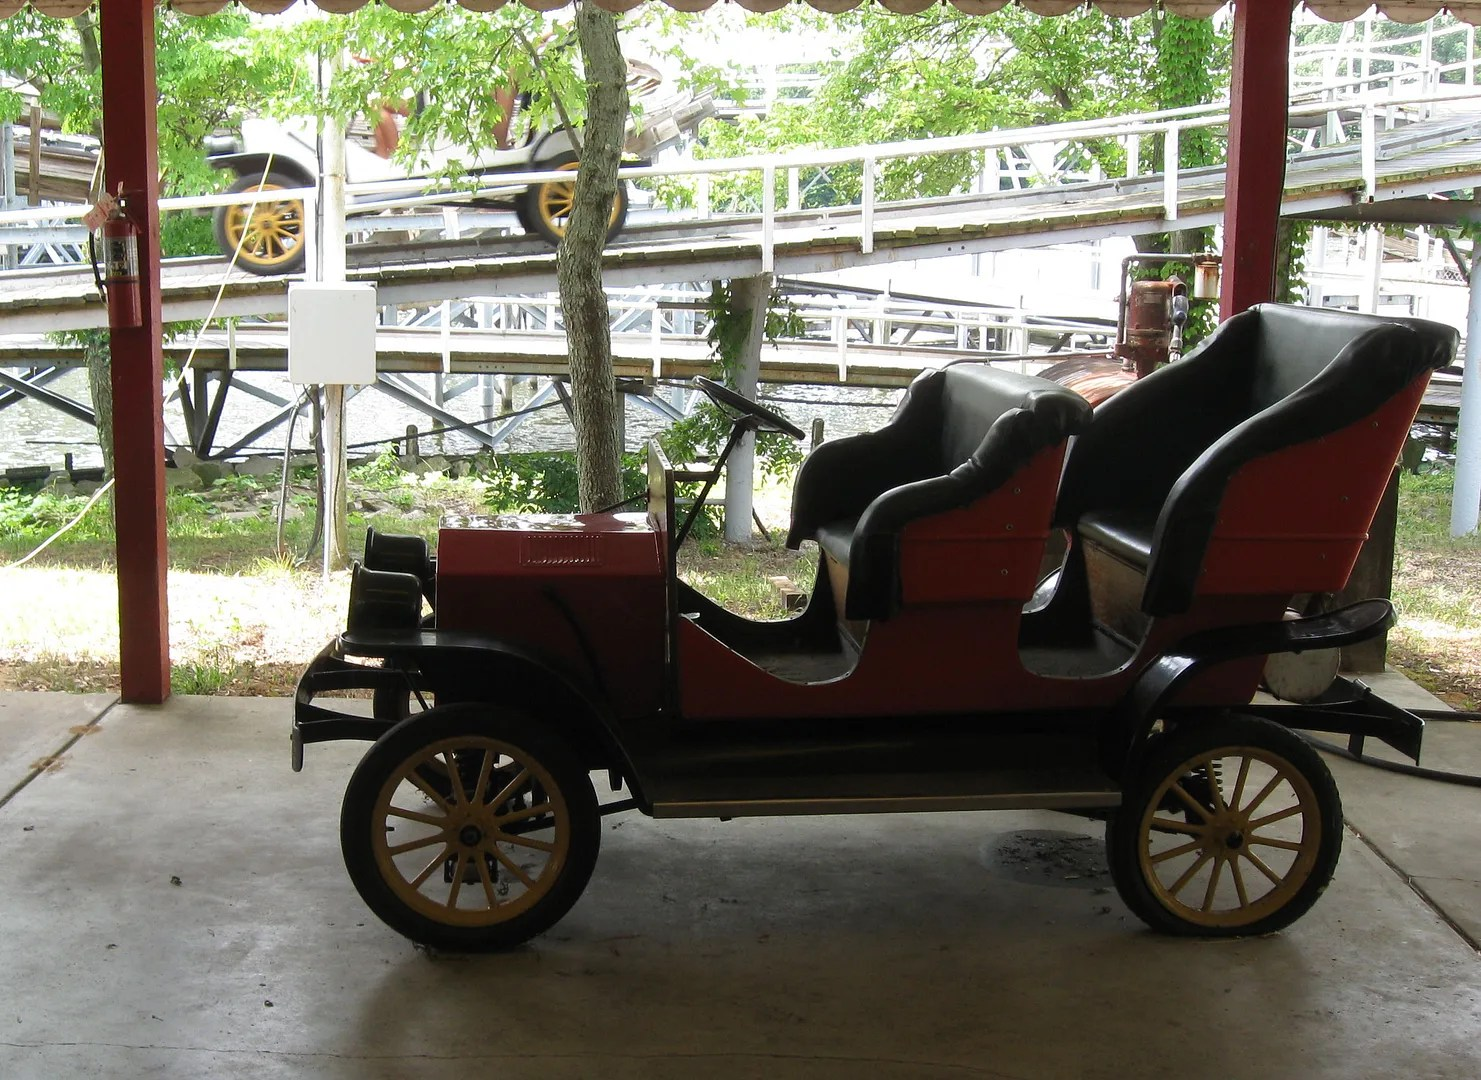 Antique autos @ Indiana Beach